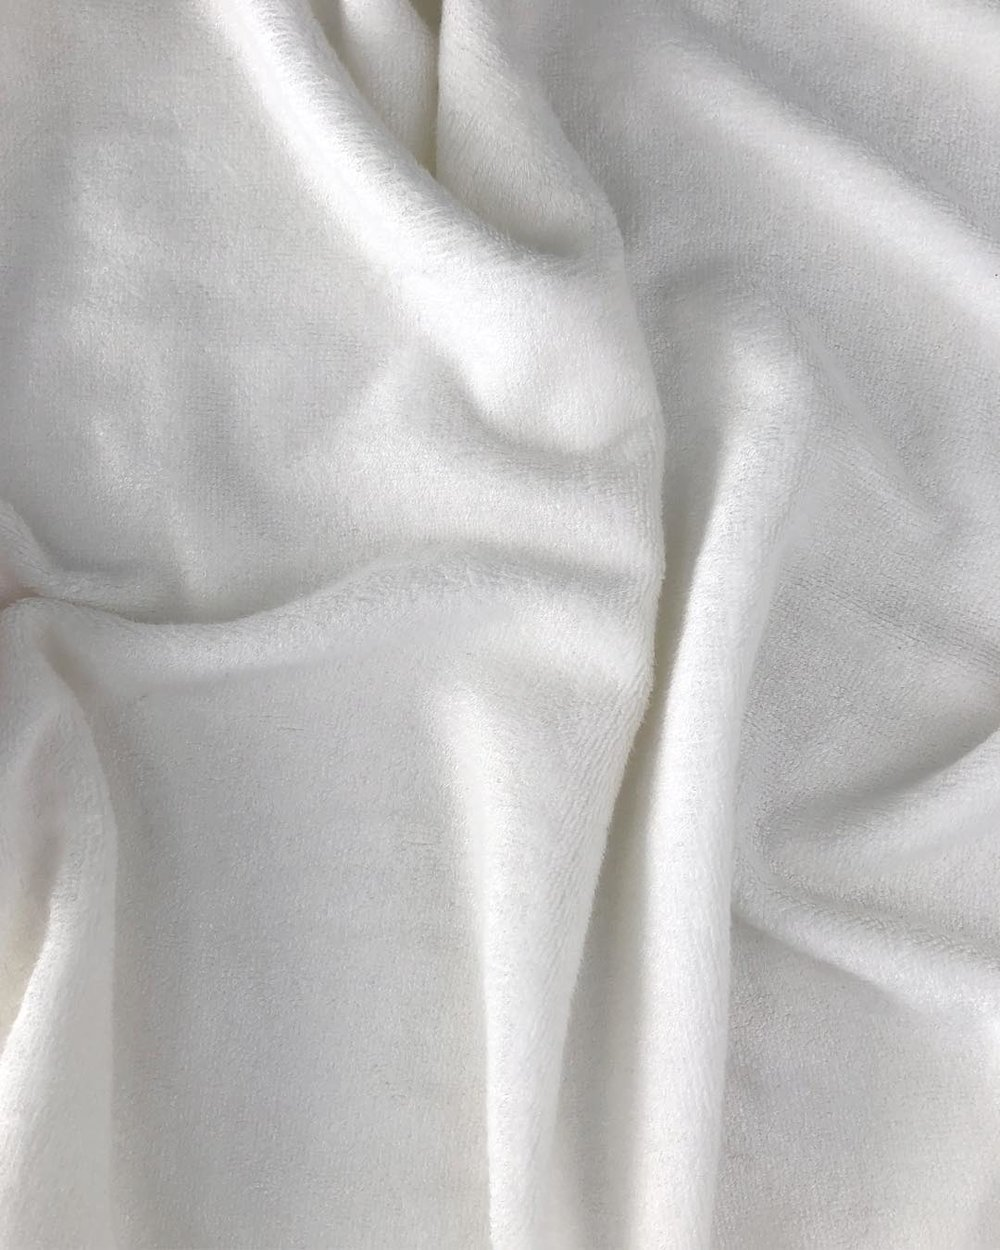 textura white bunny.jpg